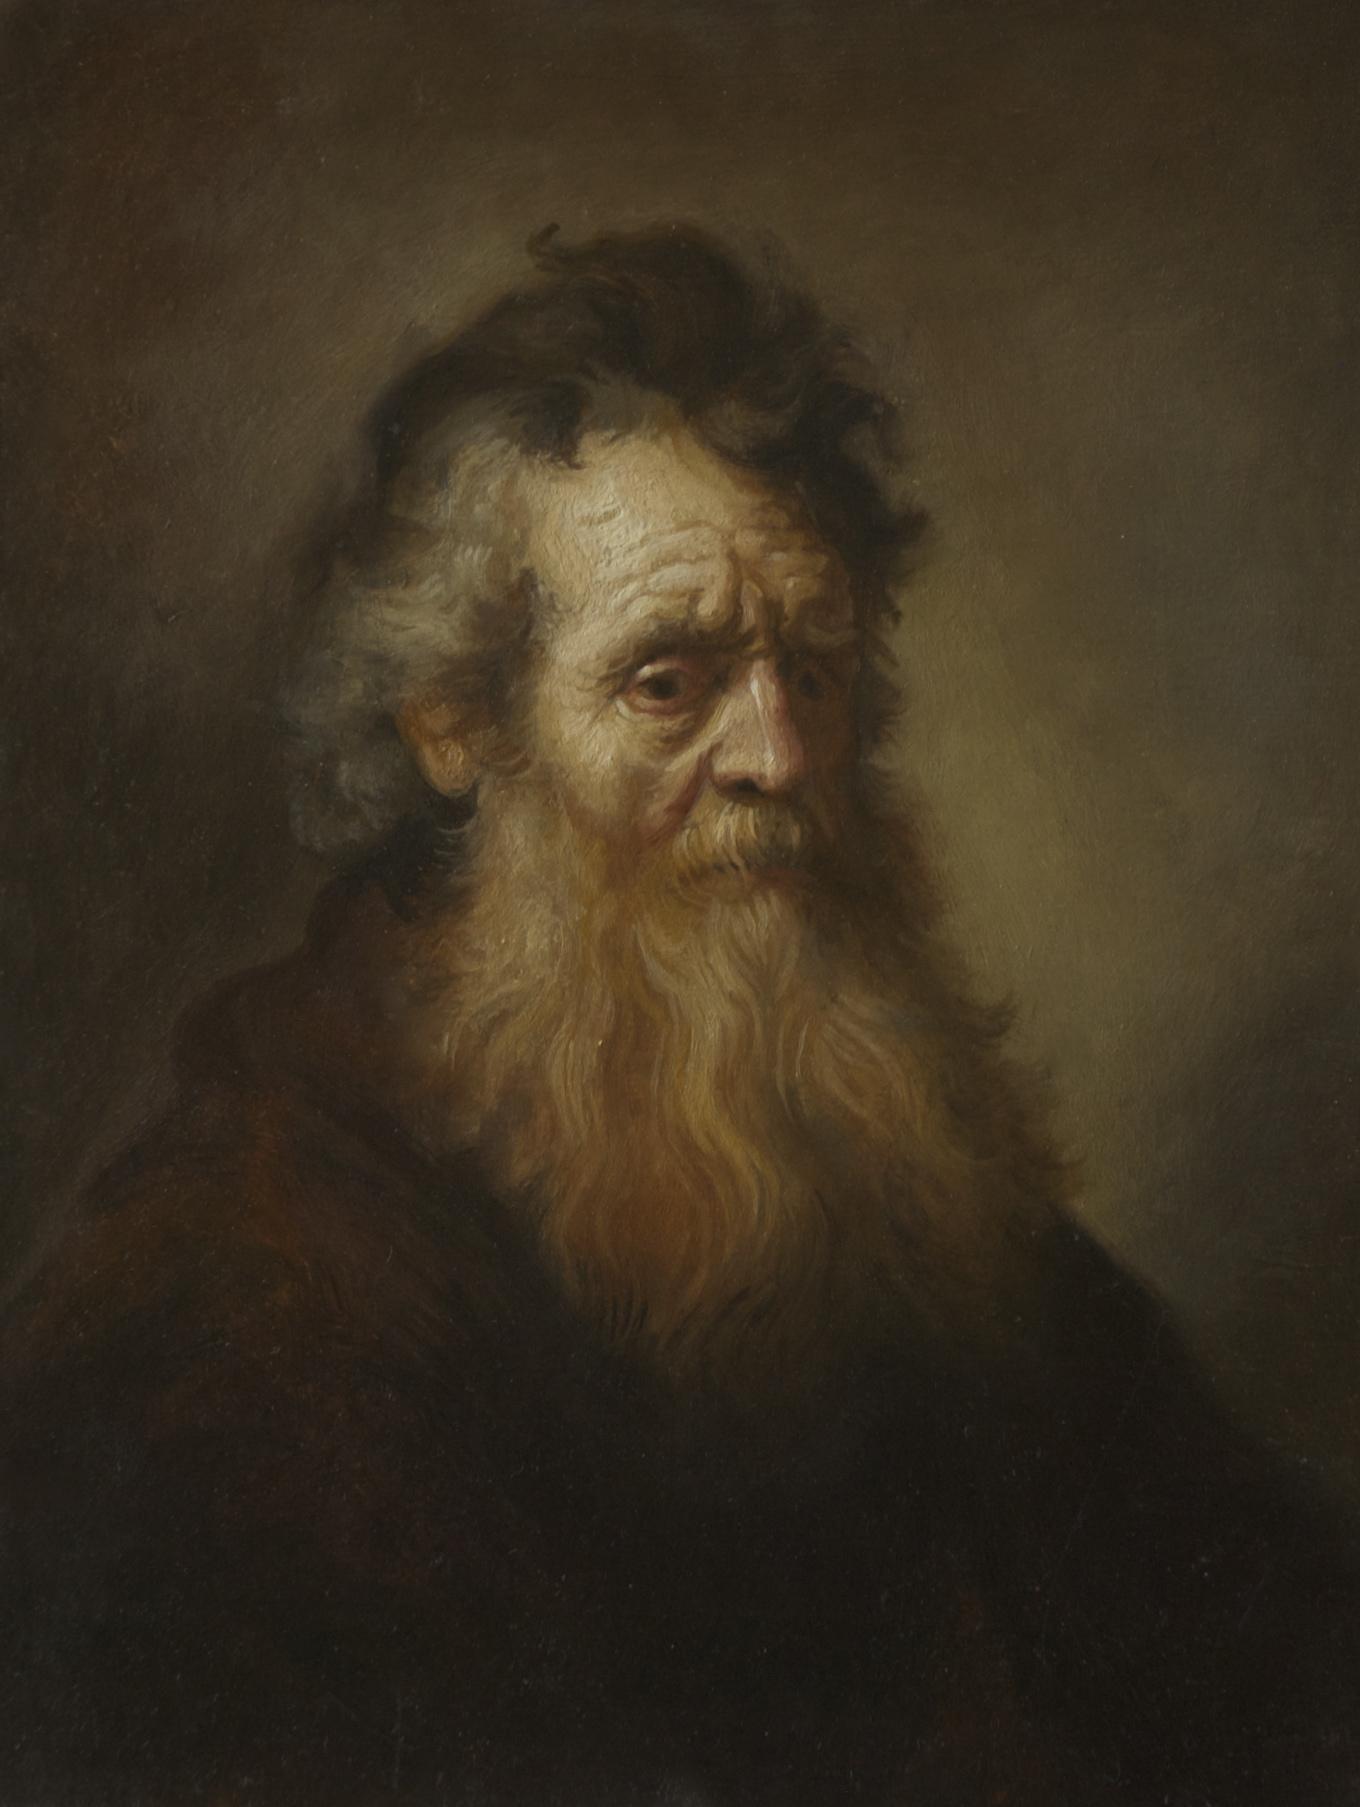 PORTRAIT OF AN OLD MAN, AFTER REMBRANDT